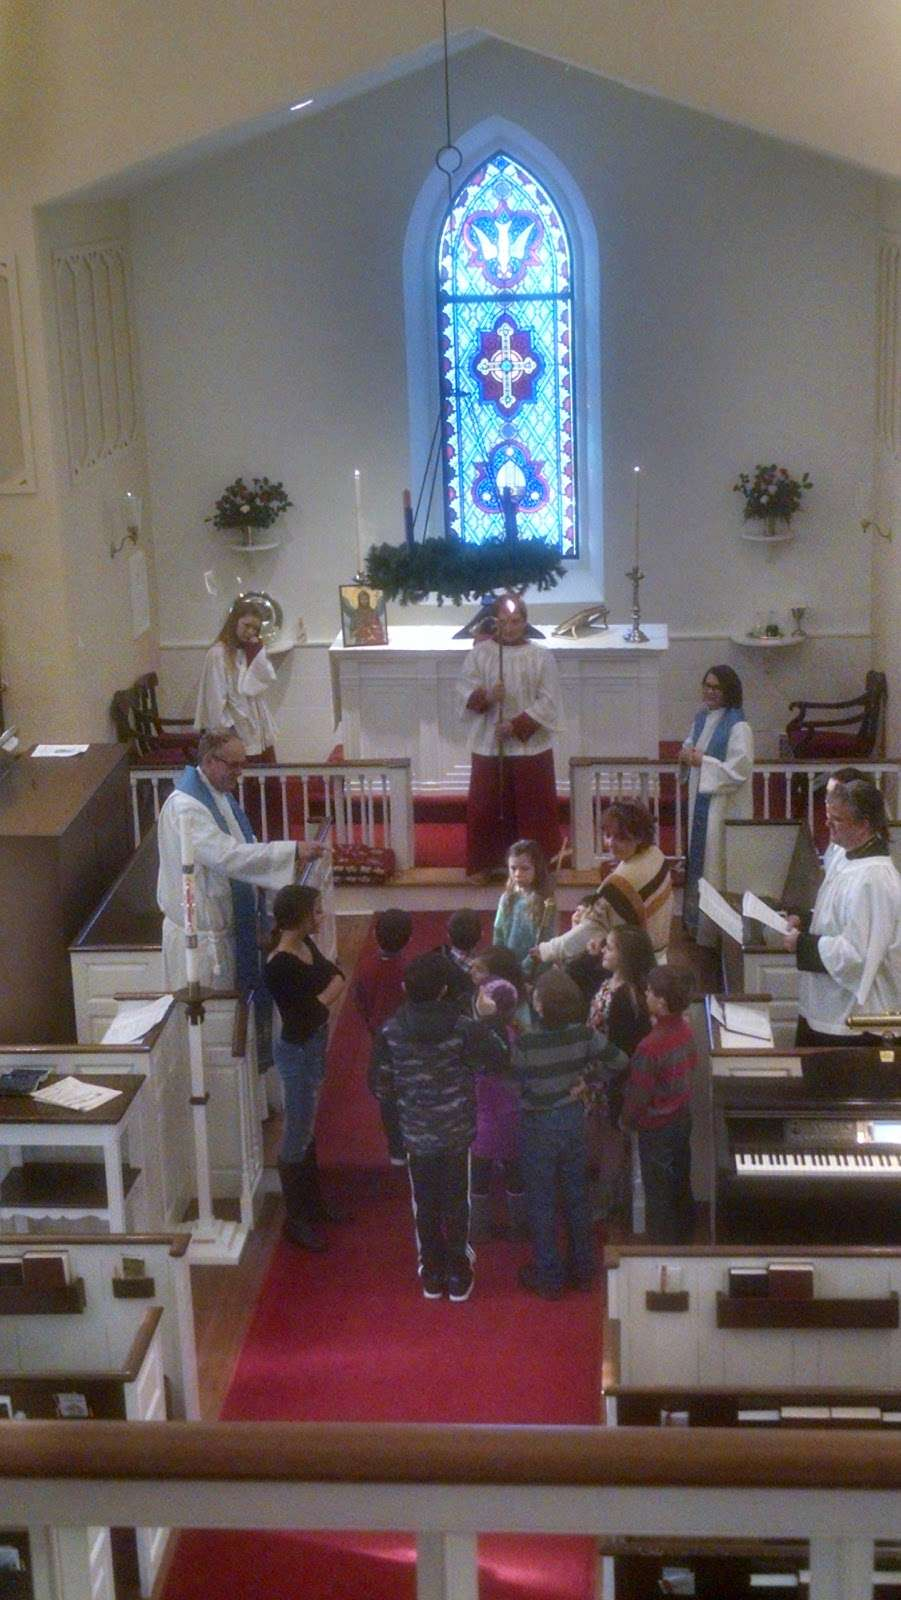 St Johns Episcopal Church - church  | Photo 2 of 3 | Address: 576 Concord Rd, Glen Mills, PA 19342, USA | Phone: (610) 459-2994